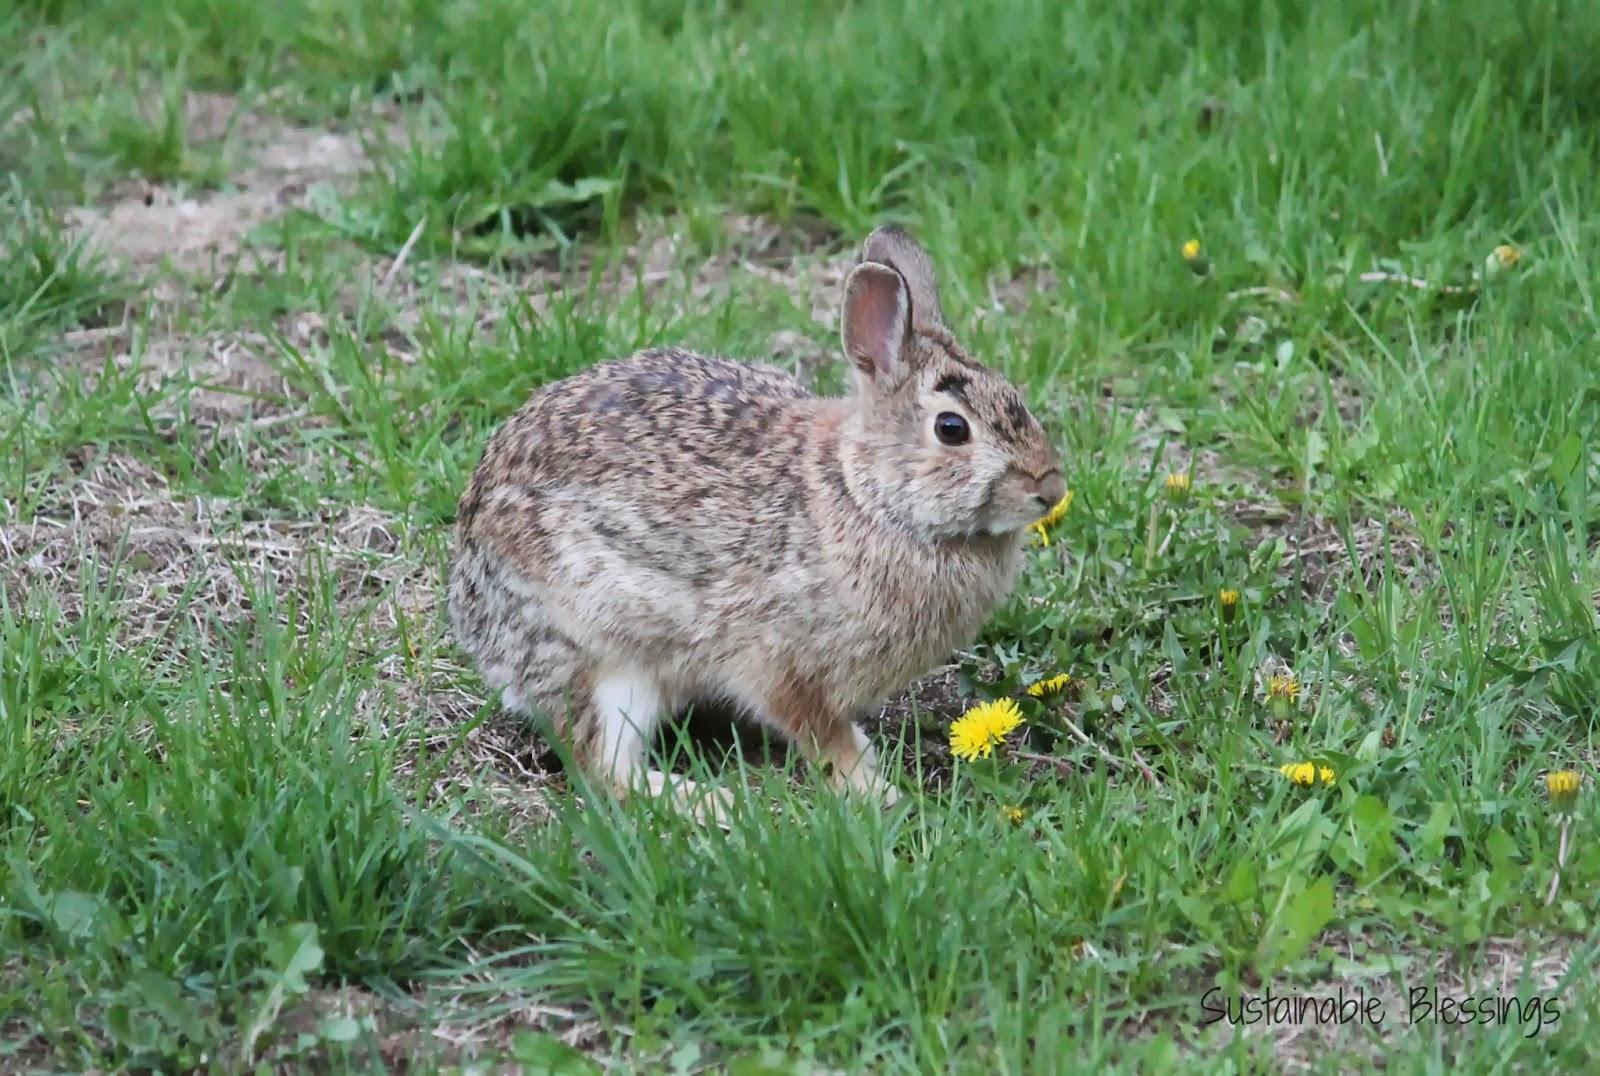 Wild Backyard Rabbits : Sustainable Blessings Back Yard Wildlife